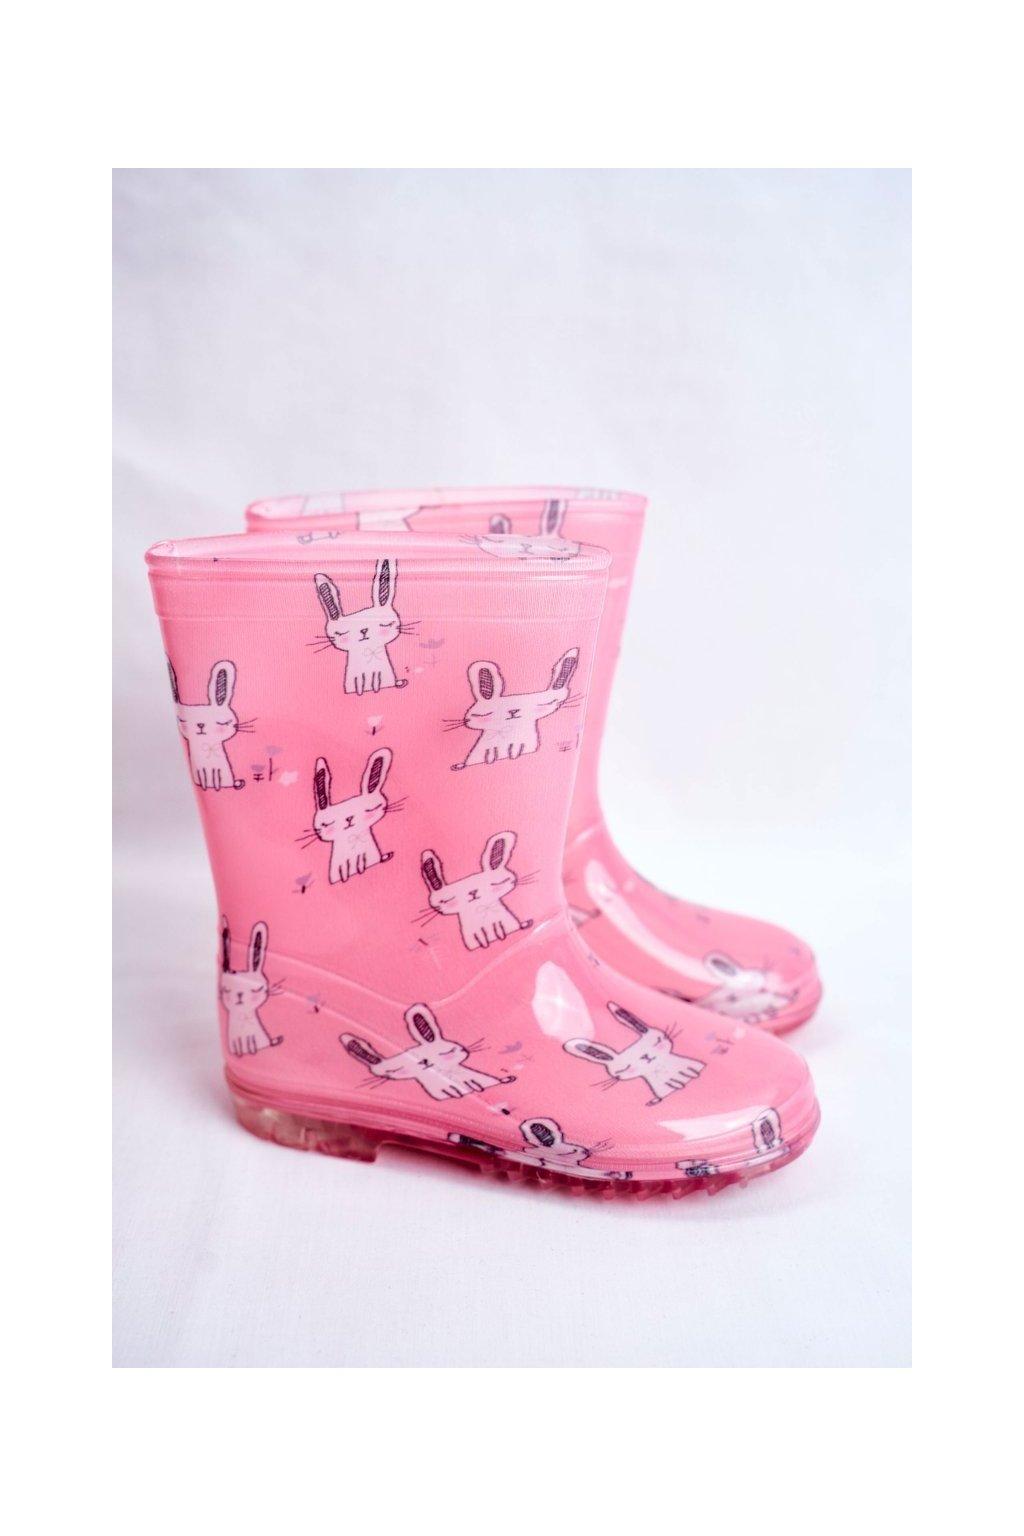 Ružová obuv kód topánok HMY-2 RABBIT